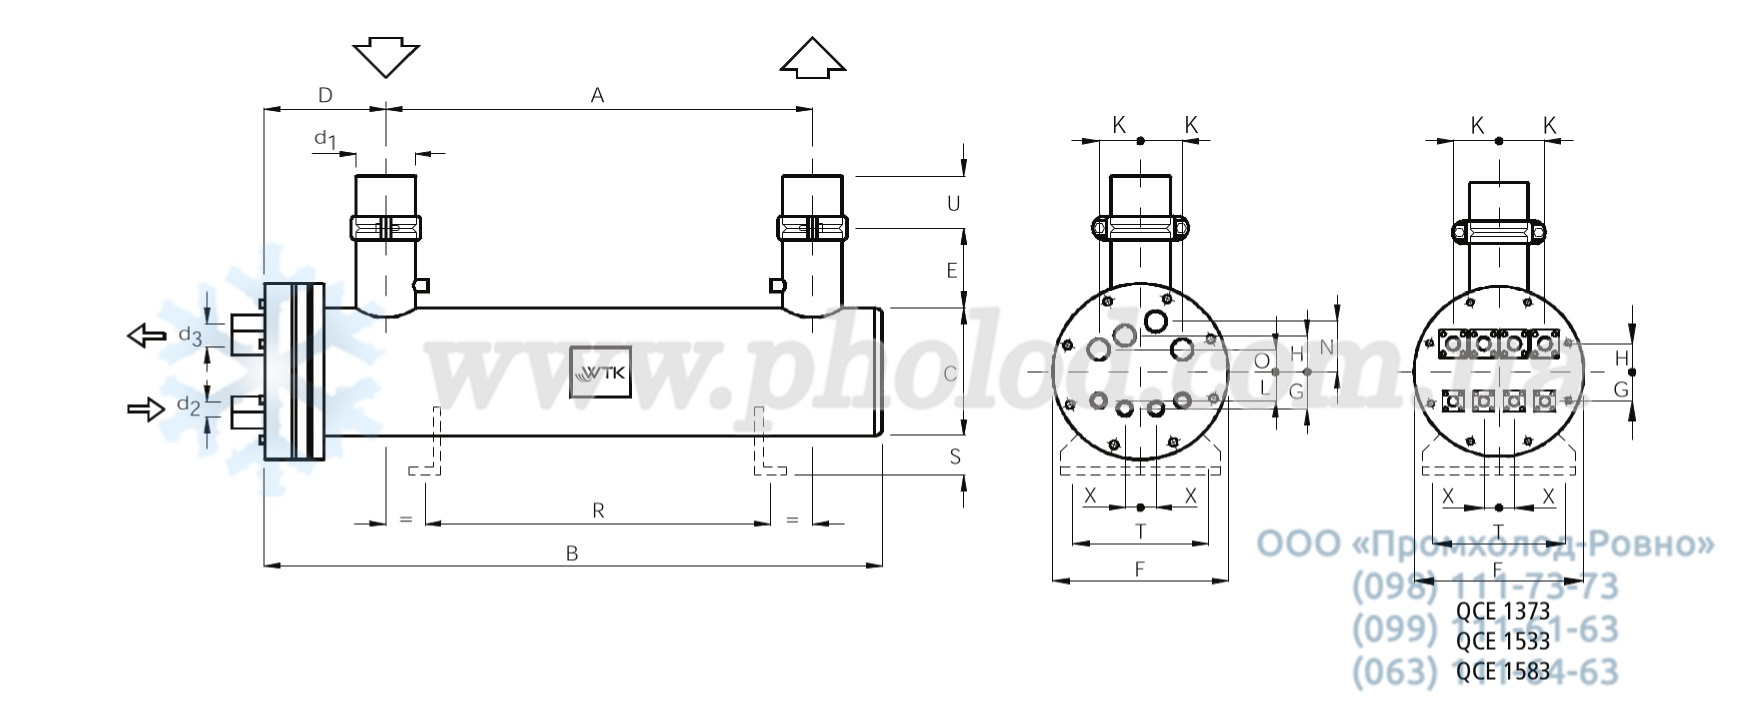 Кожухотрубный испаритель WTK QCE 1583 Артём Пластины теплообменника Tranter GD-016 P Гатчина